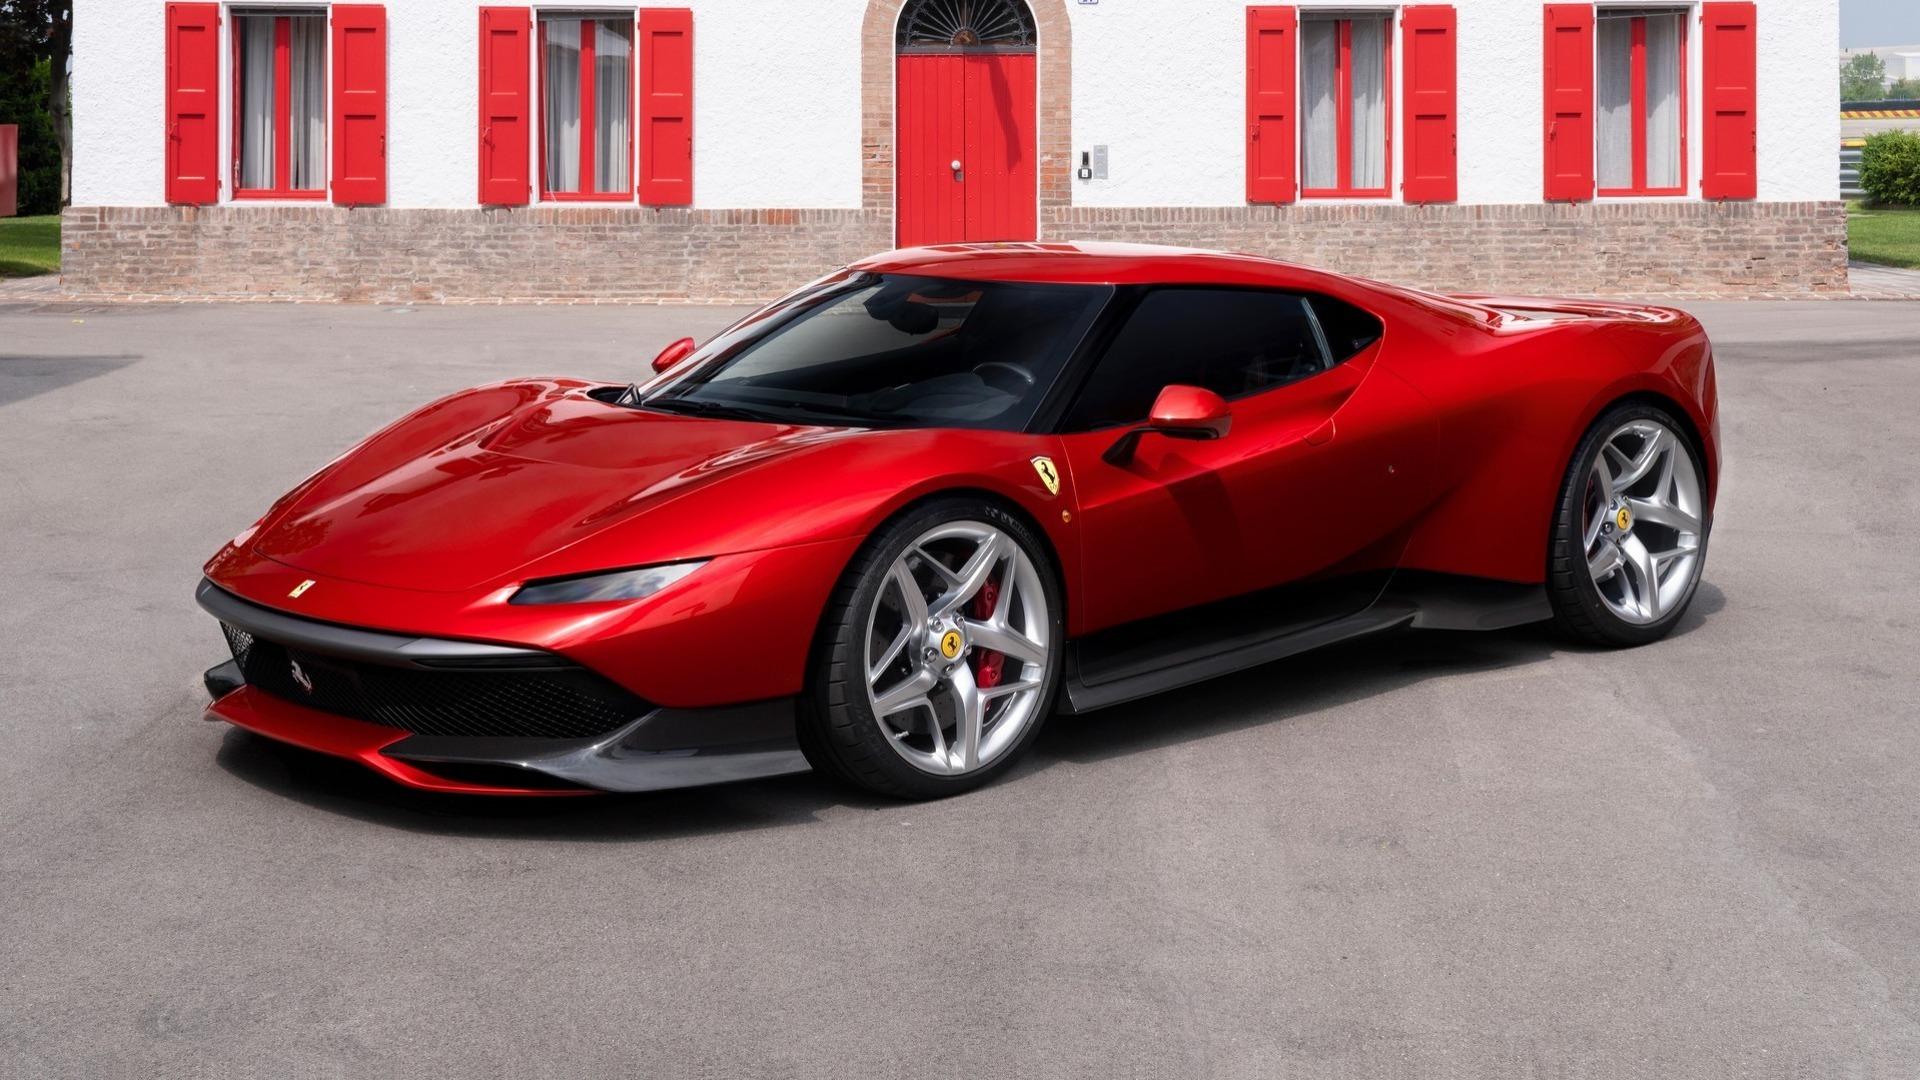 Ferrari Sp38 One Off 2